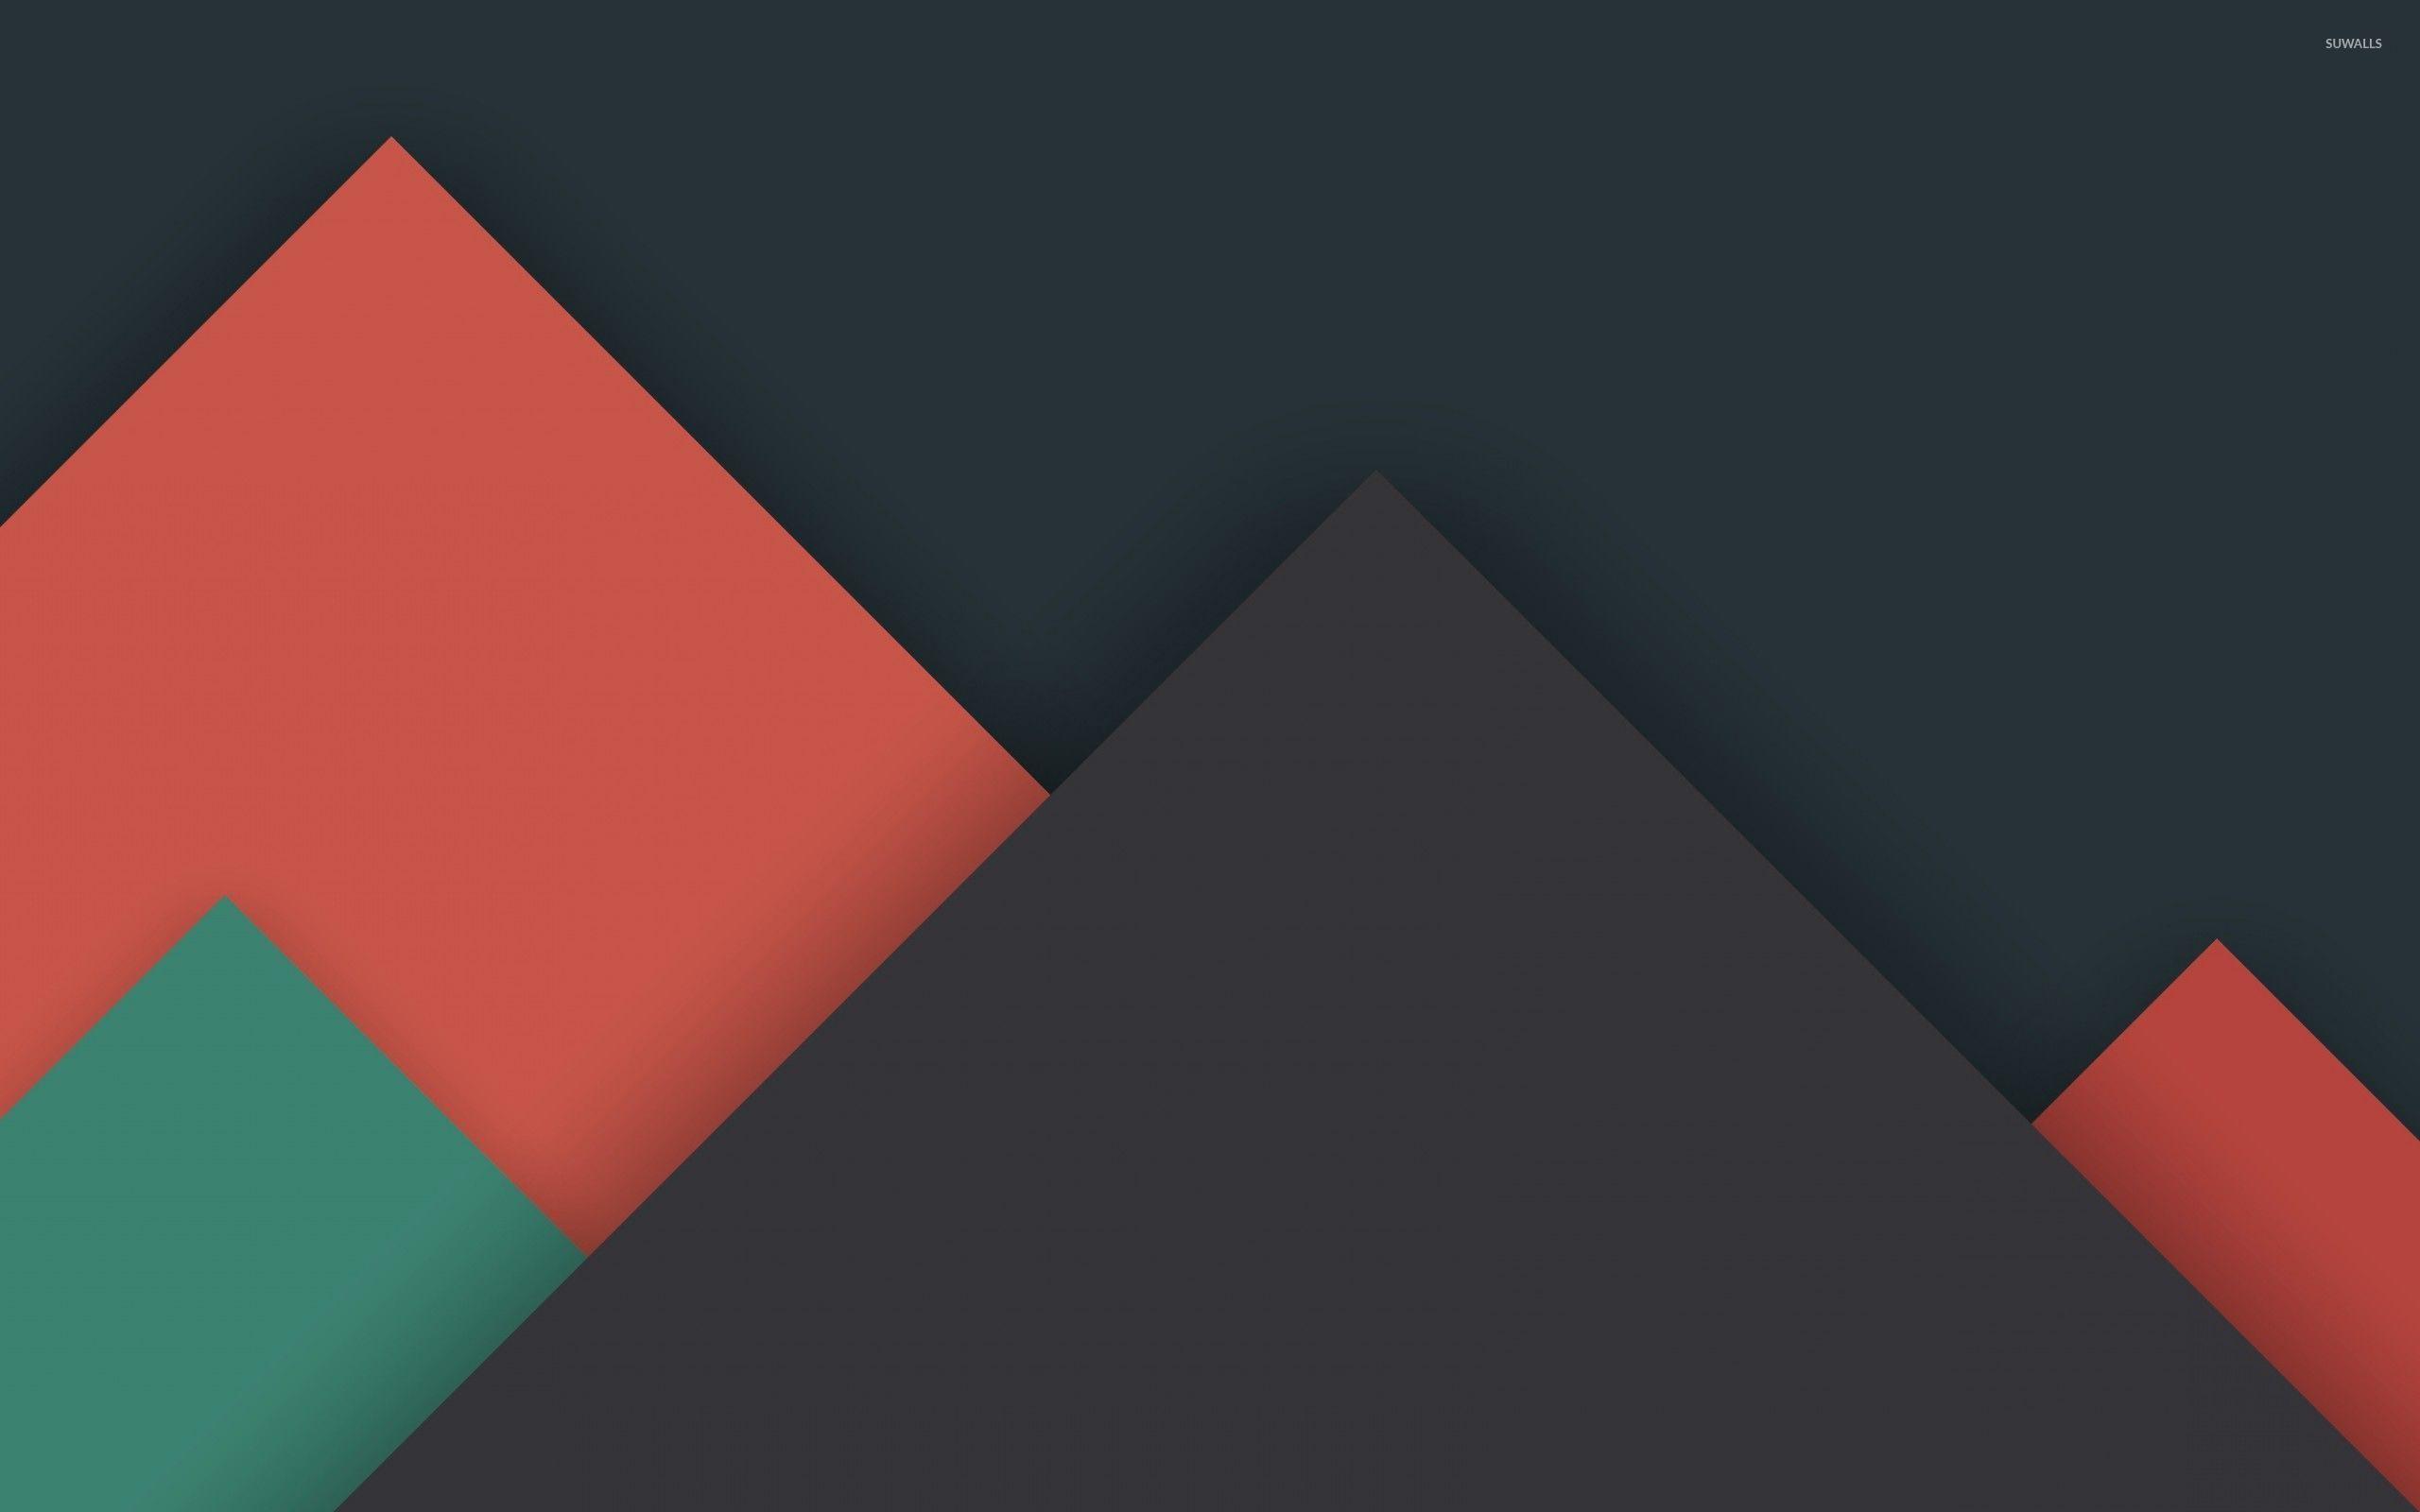 Shapes Desktop Wallpapers   Top Shapes Desktop Backgrounds 2560x1600